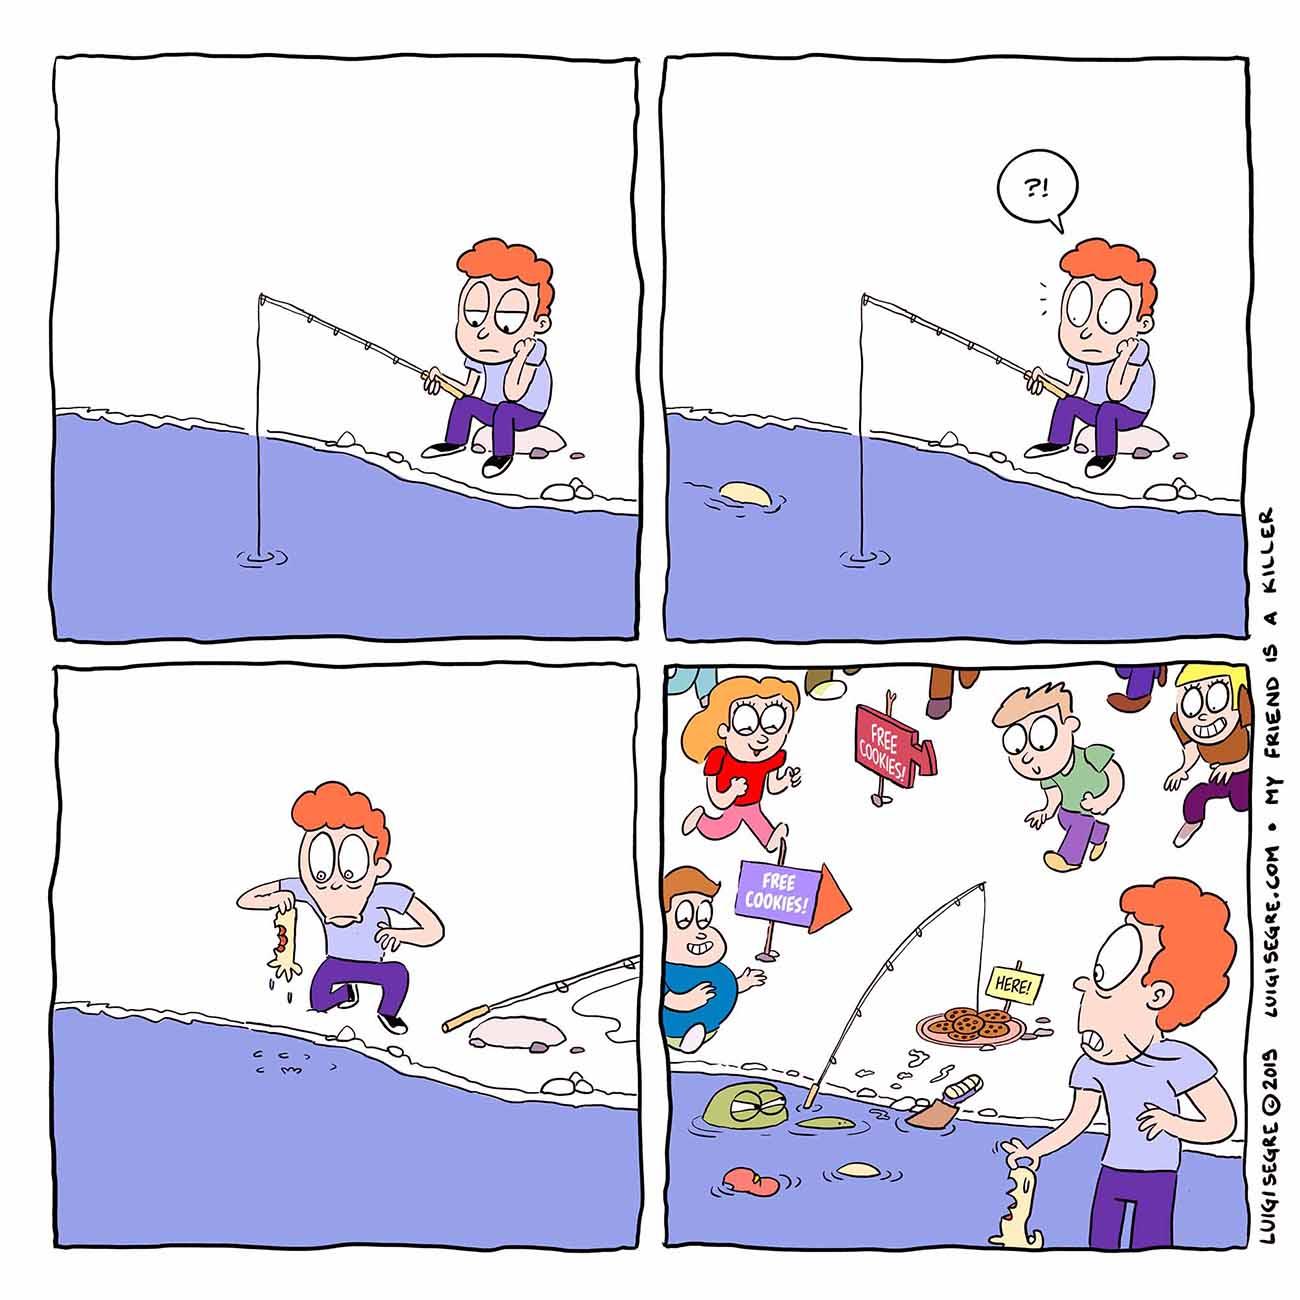 Contenuti_Low_Res_Luigi_Segre_Cartoons_2019_my_friend_is_a_killer_11.jpg